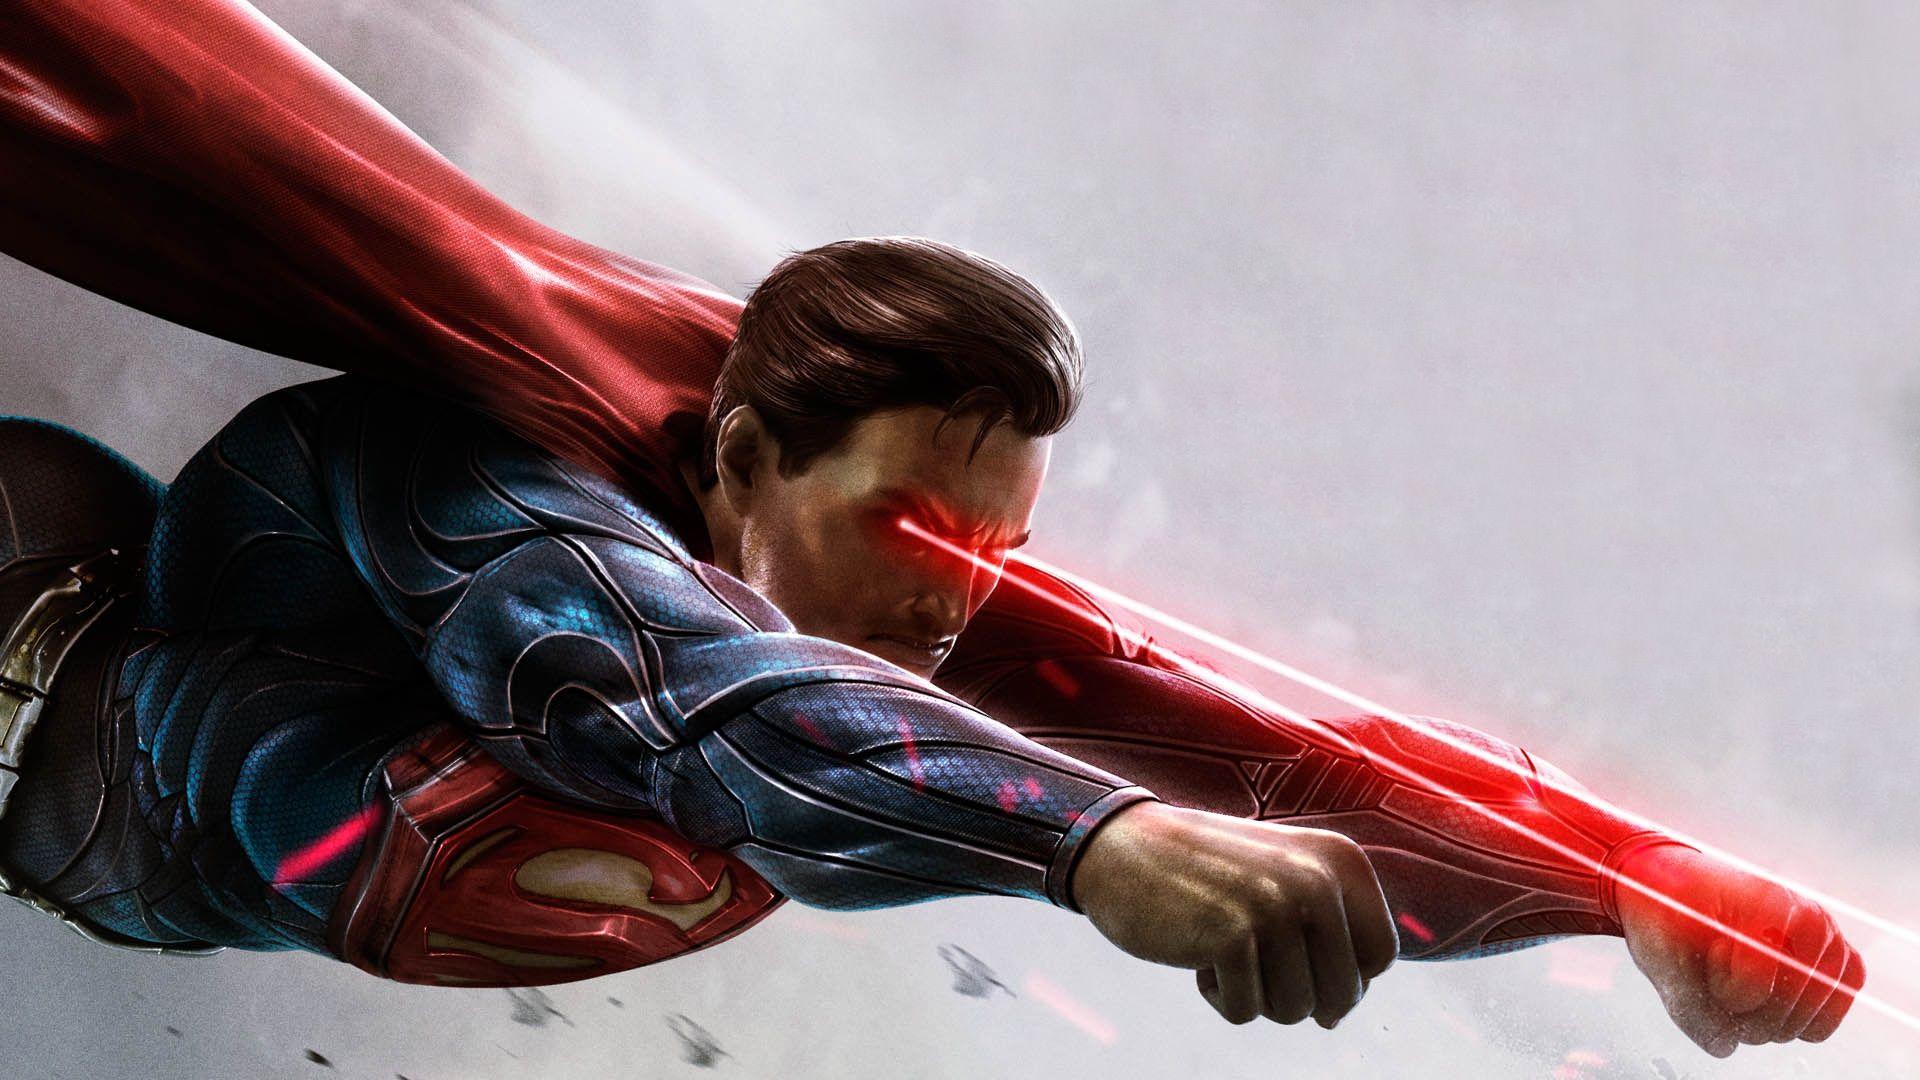 Best 35 Superman HD Wallpaper for Desktop Superman